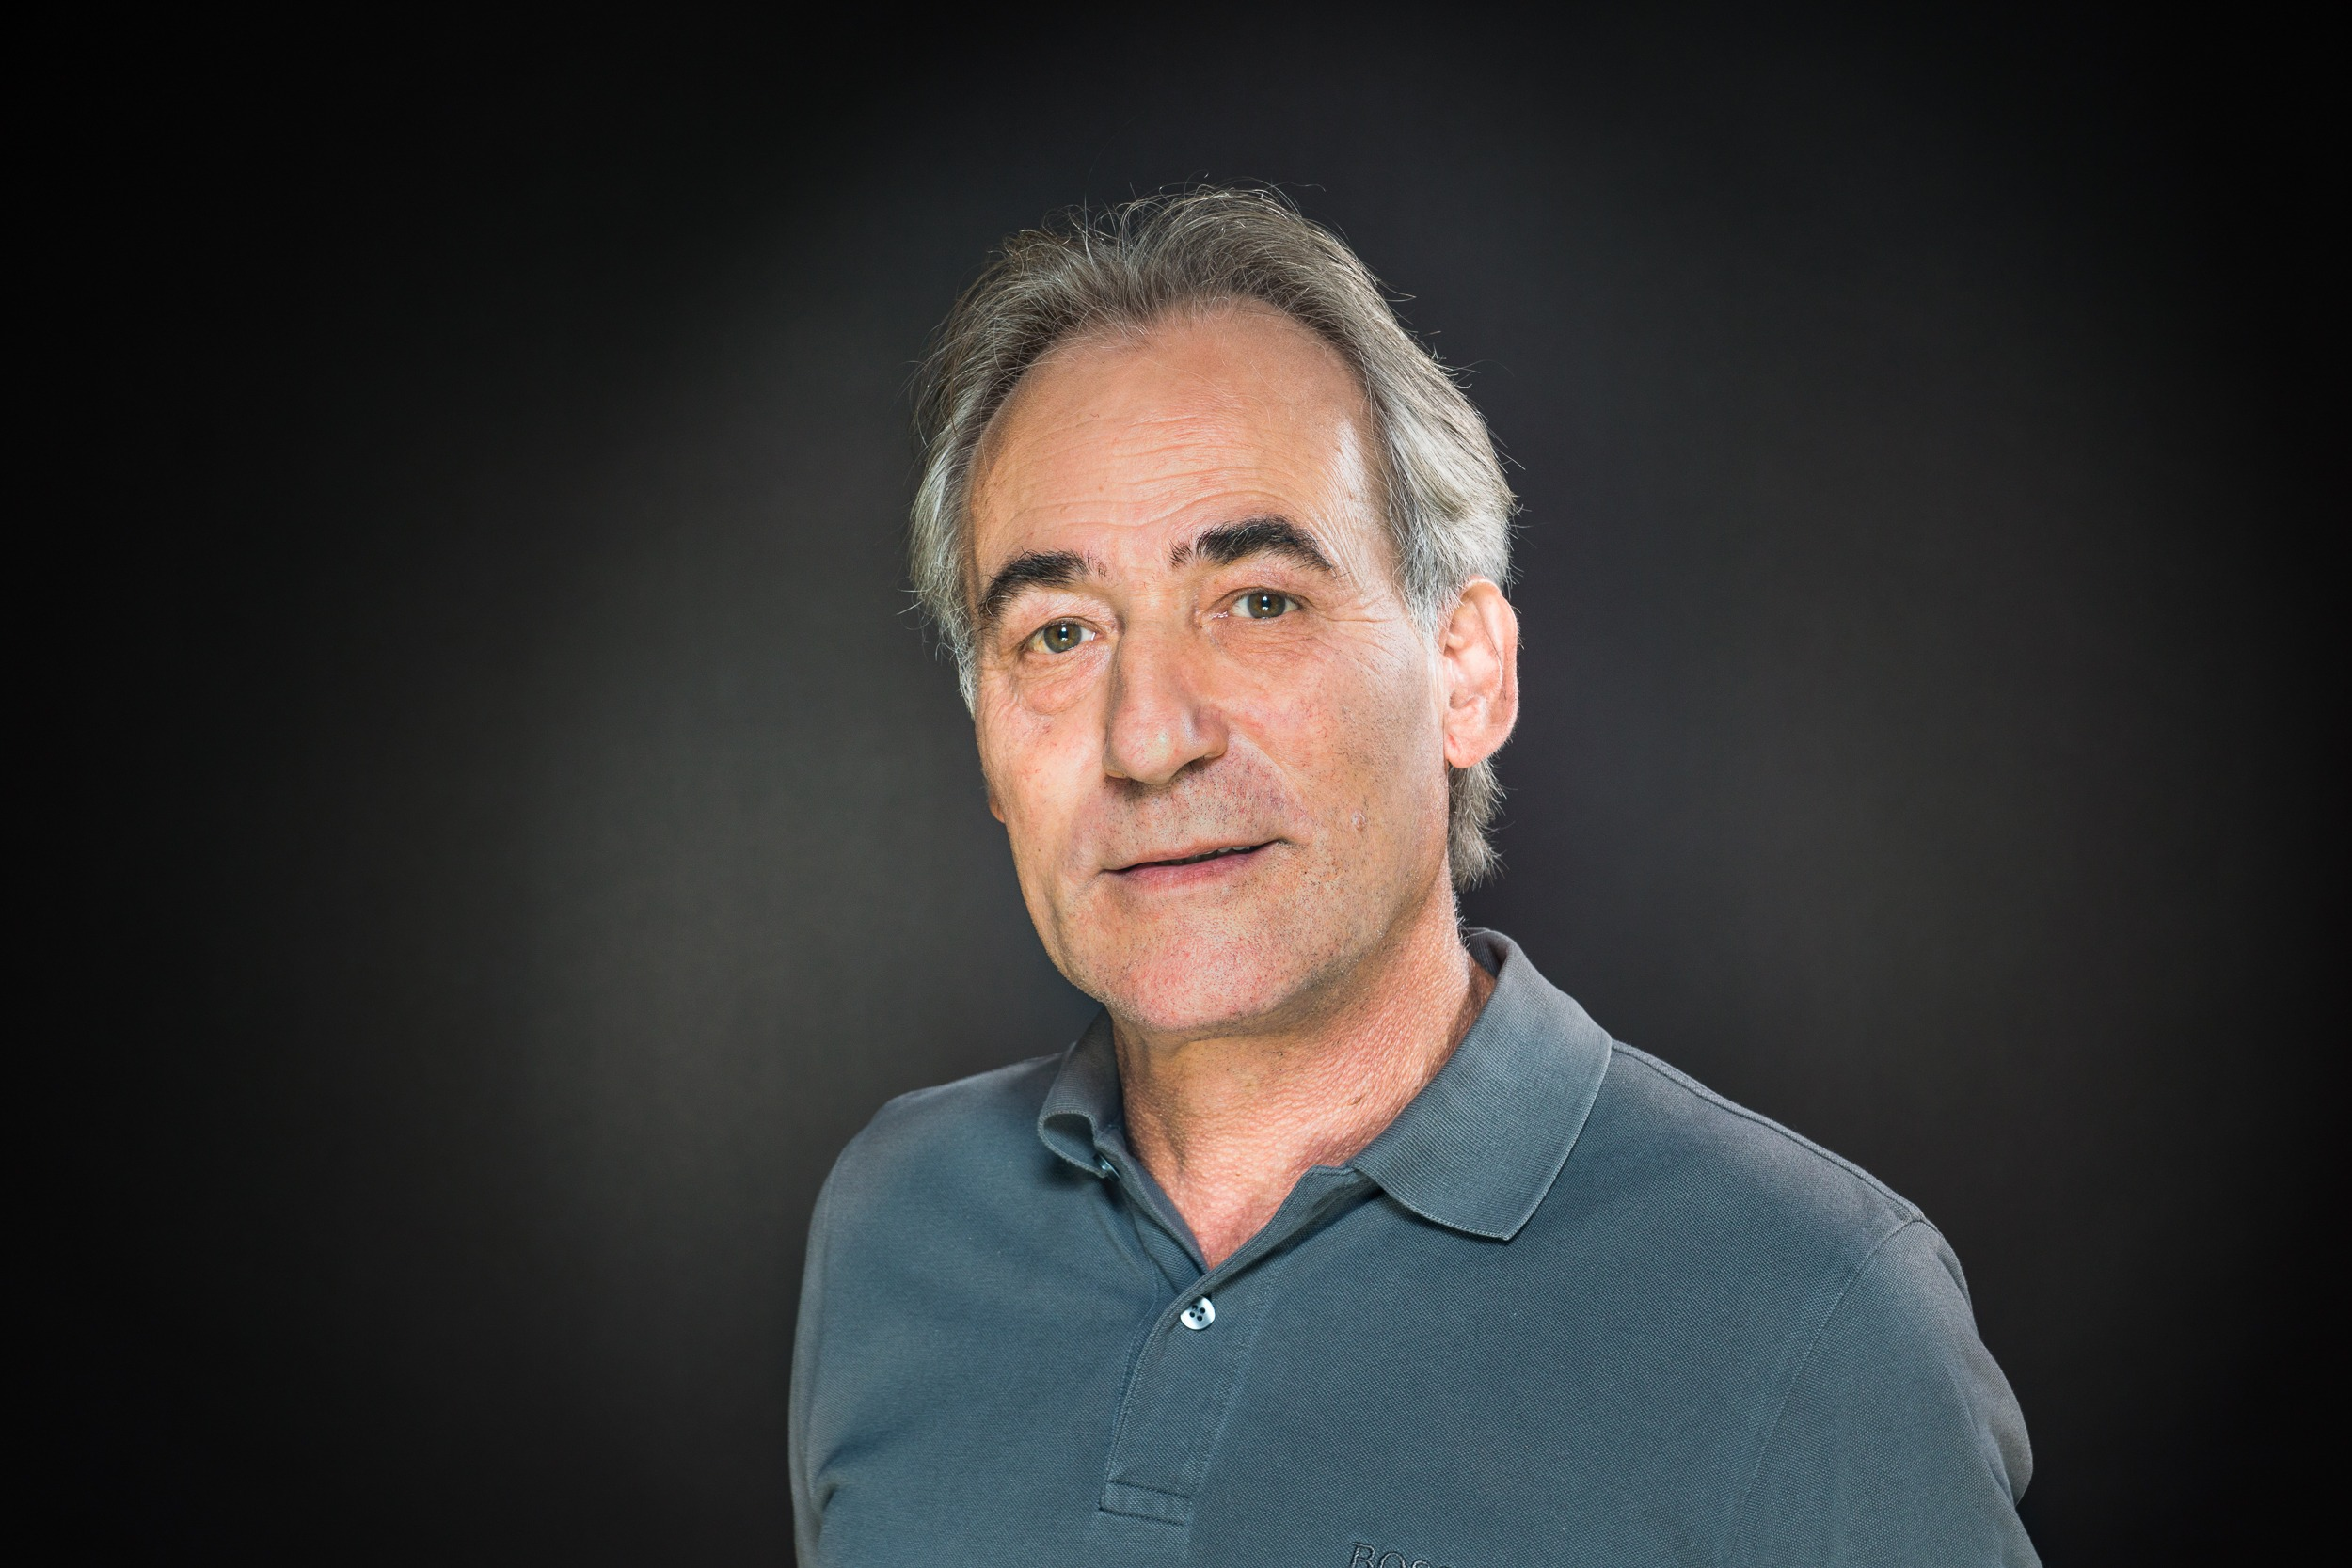 Uwe Twardowski